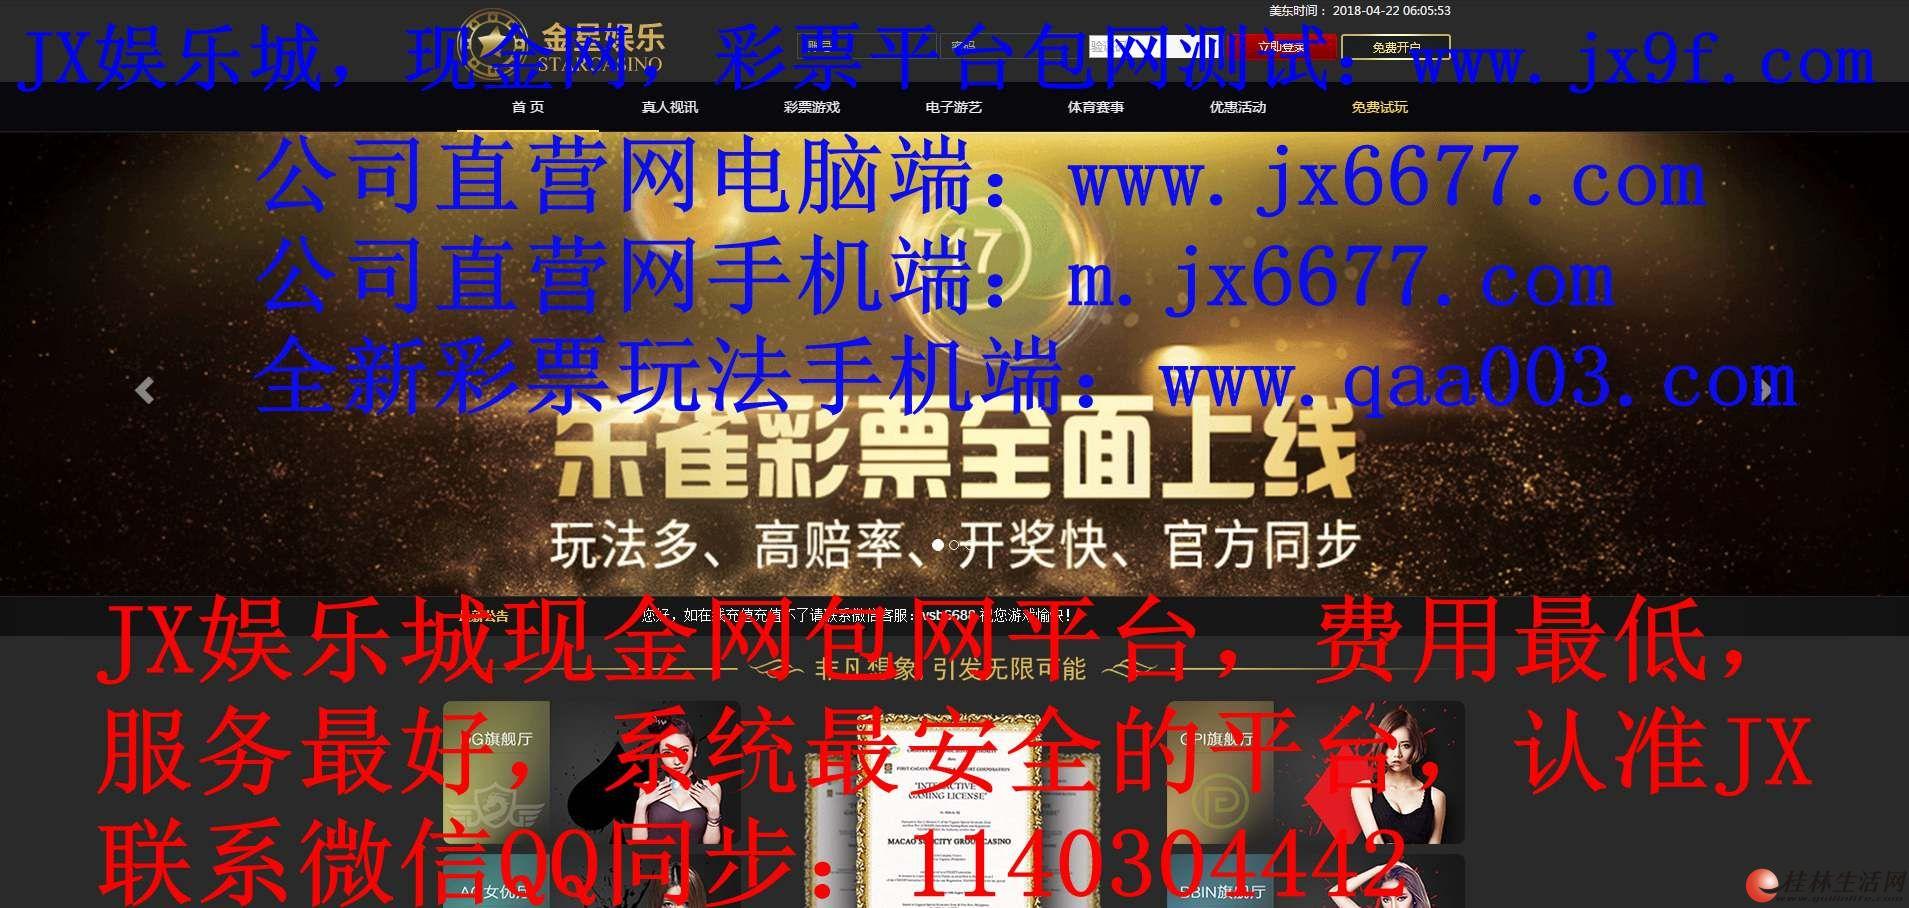 JX平台网站建设外包+Q1140304442 直营网站:jx6677